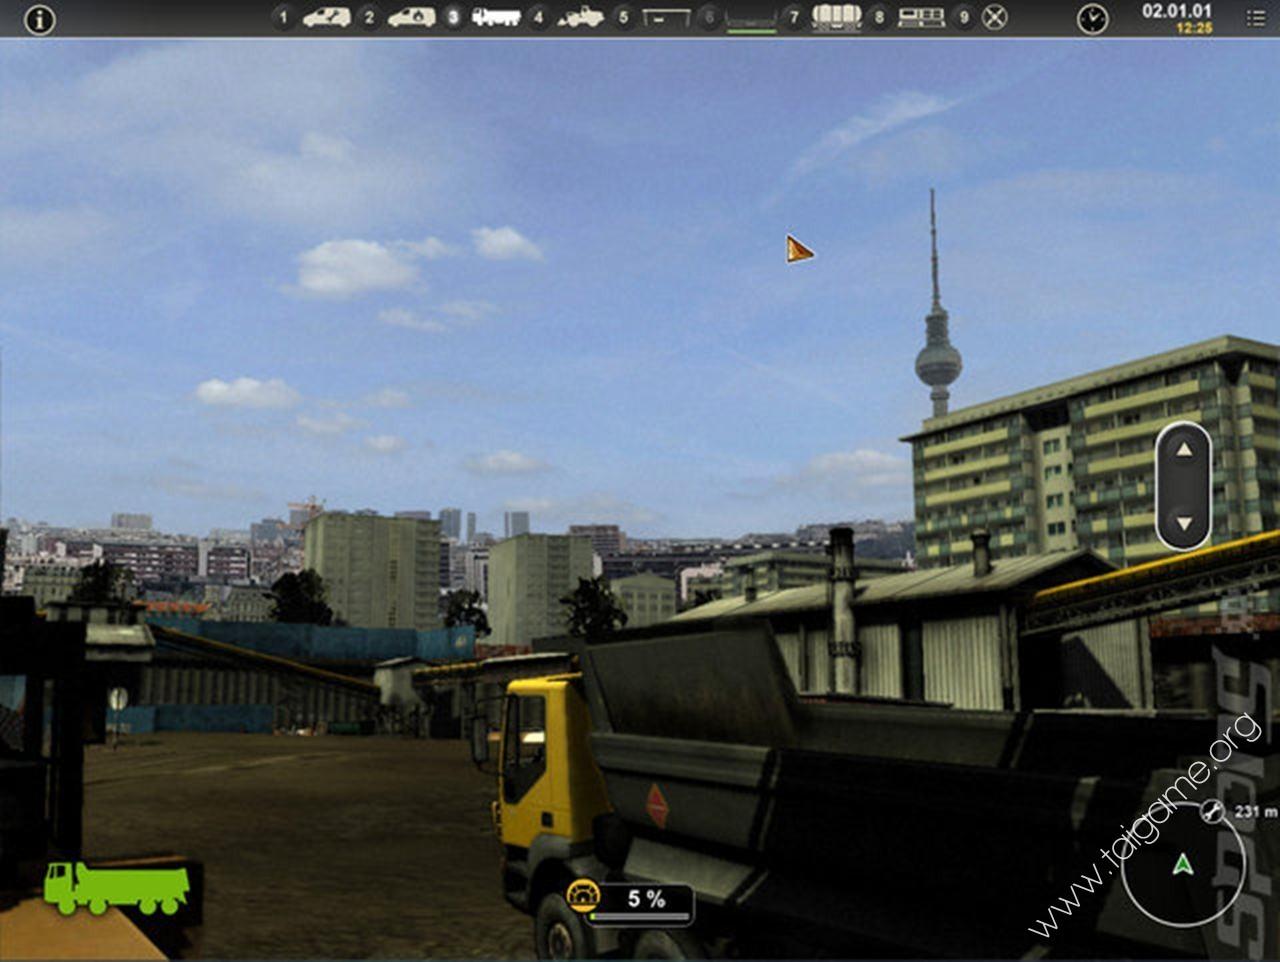 Epsxe Enhanced Psx Emulator